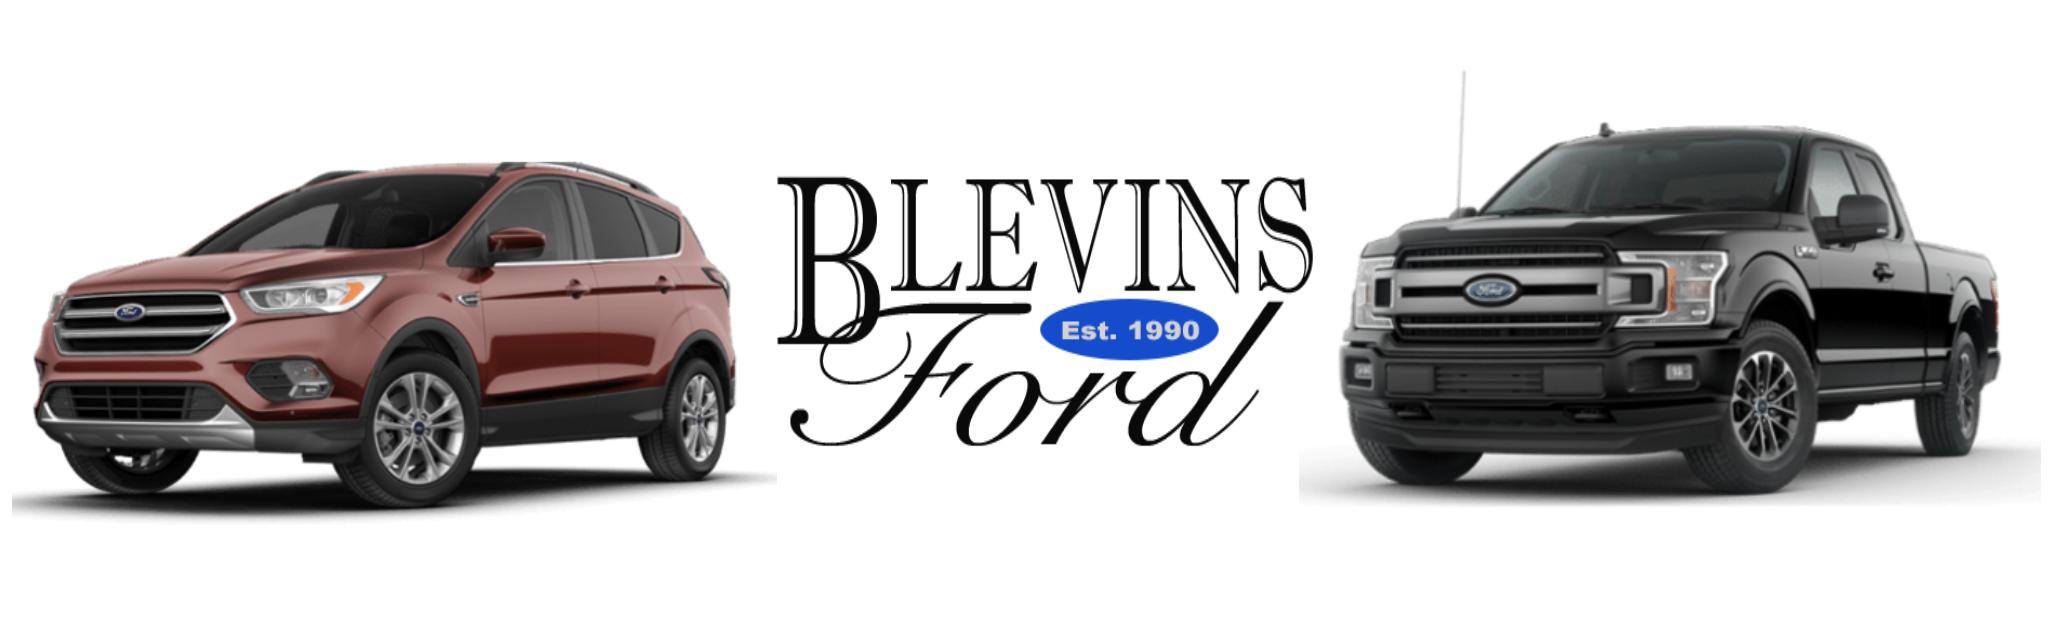 Blevins Potsdam Ny >> Blevins Ford Wwti Informnny Com